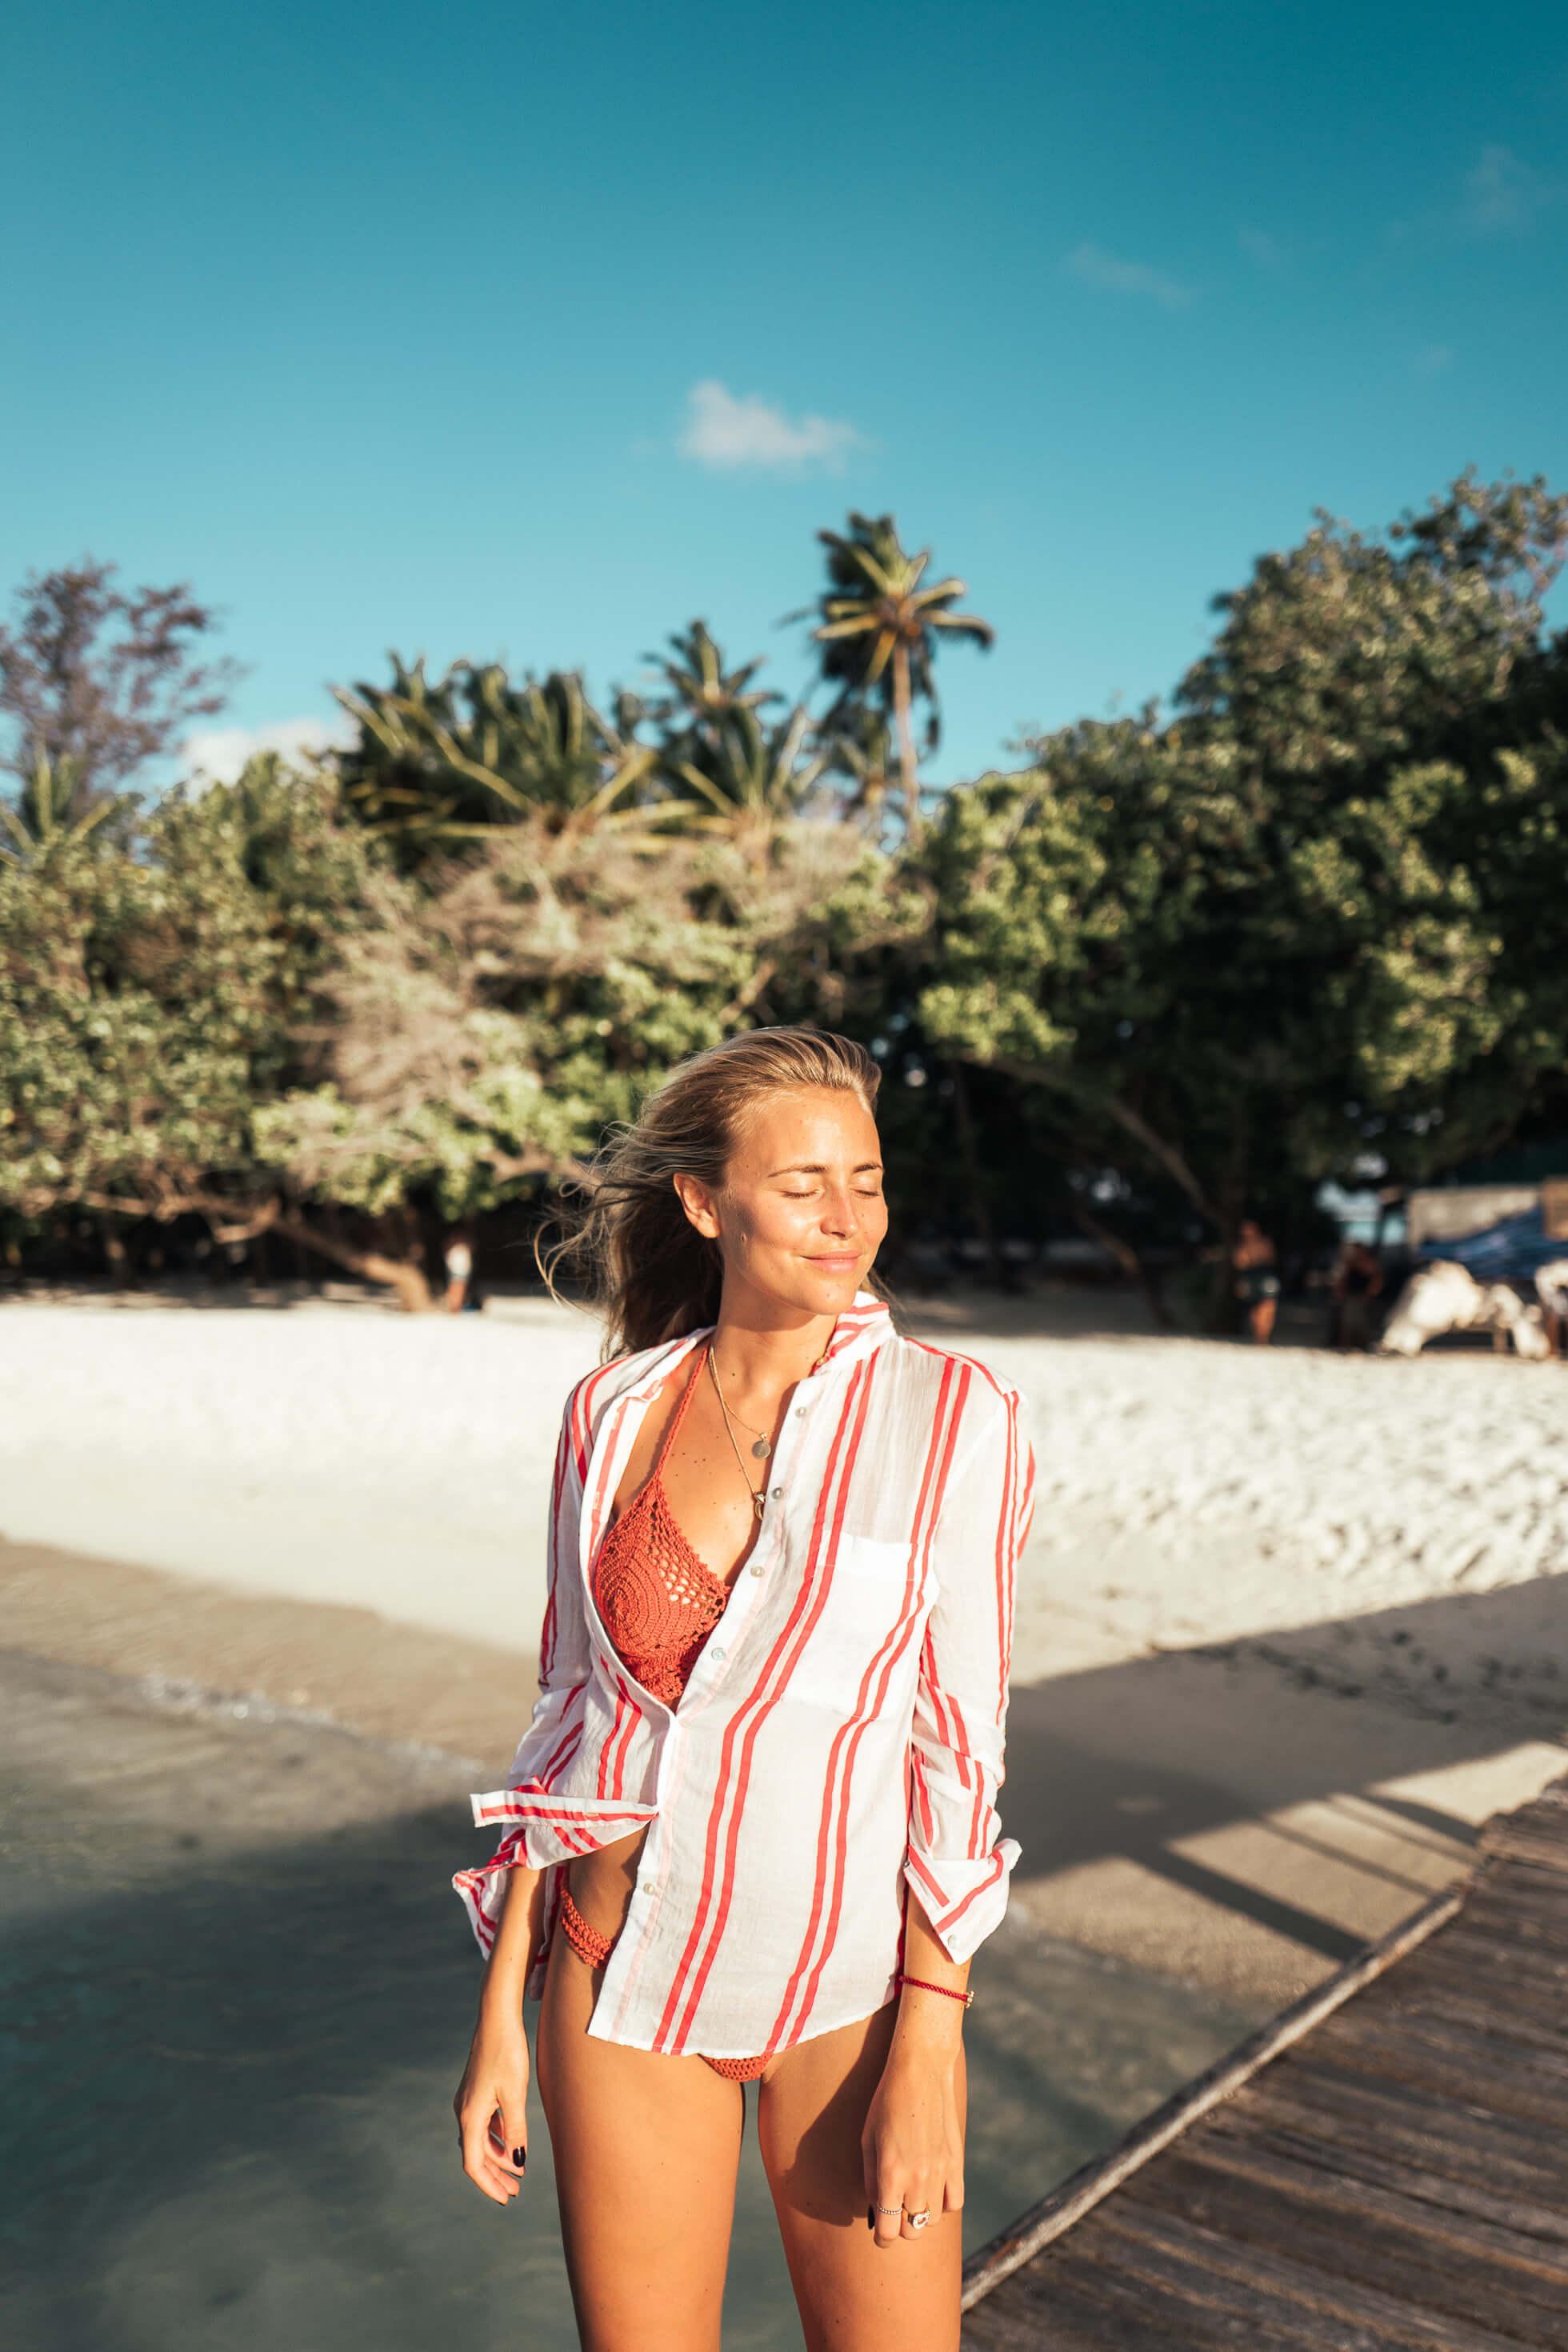 janni-deler-island-hopping-maldivesl1130099